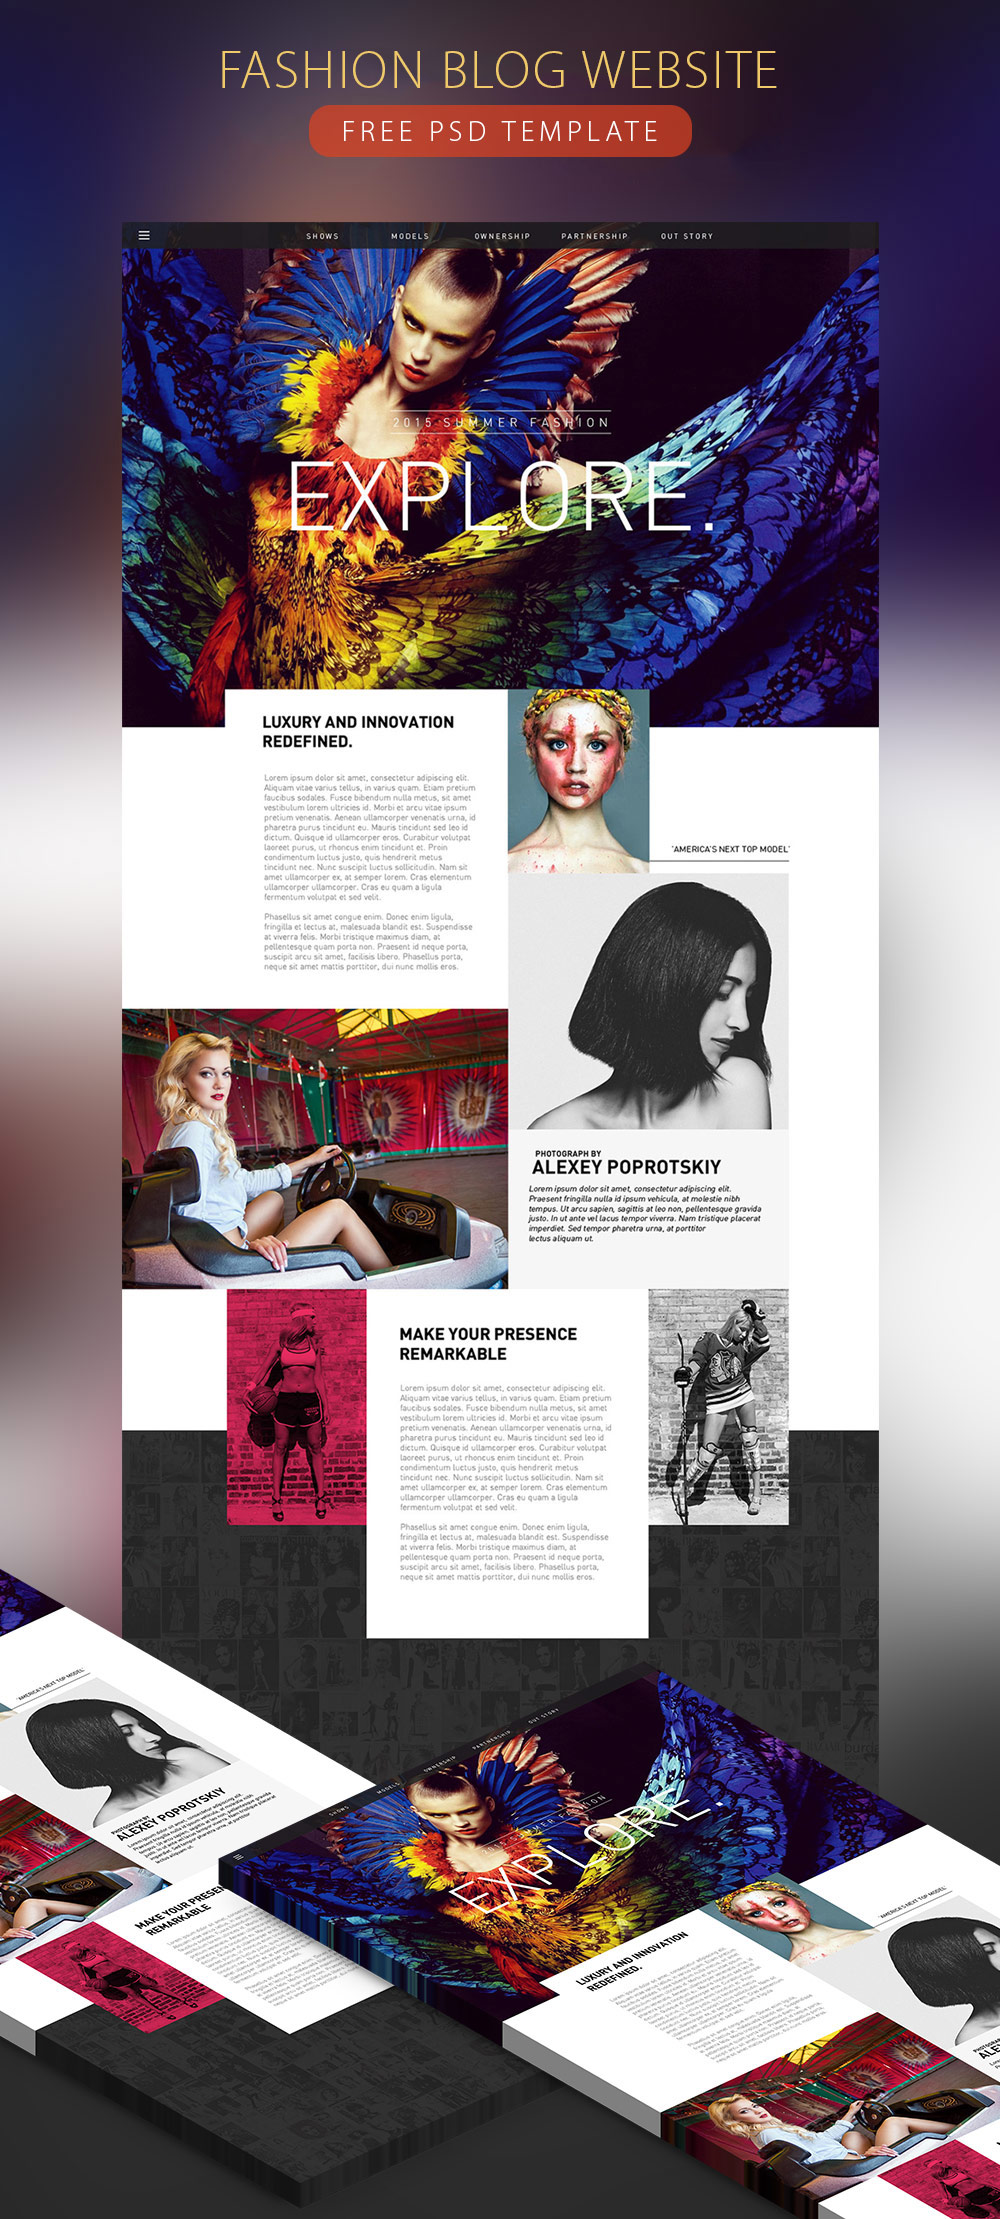 Fashion designing website templates free download samannetonic fashion designing website templates free download maxwellsz